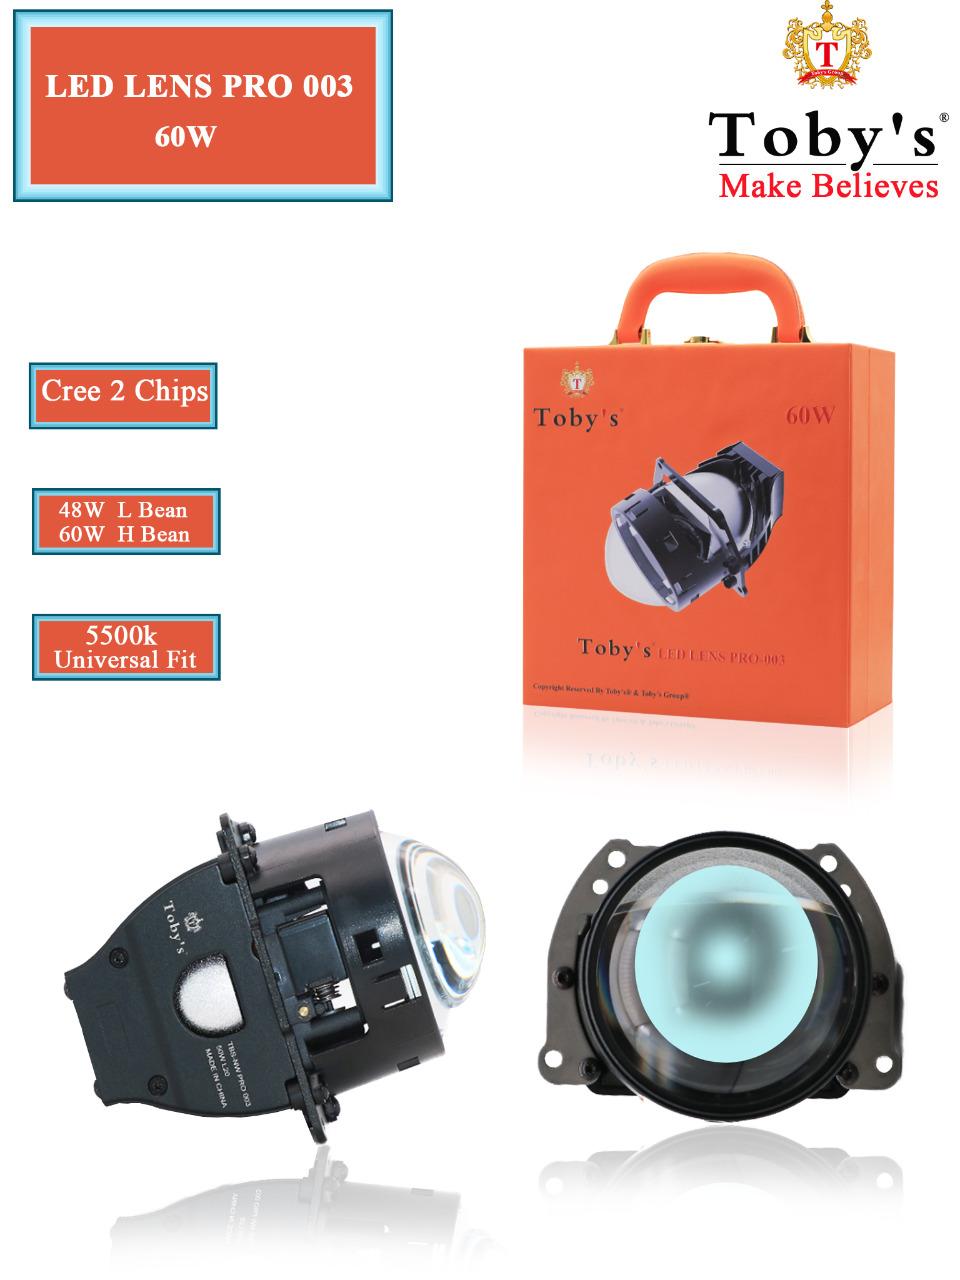 PRO 003 Projector Lens Universal fit 5500k HID Headlight